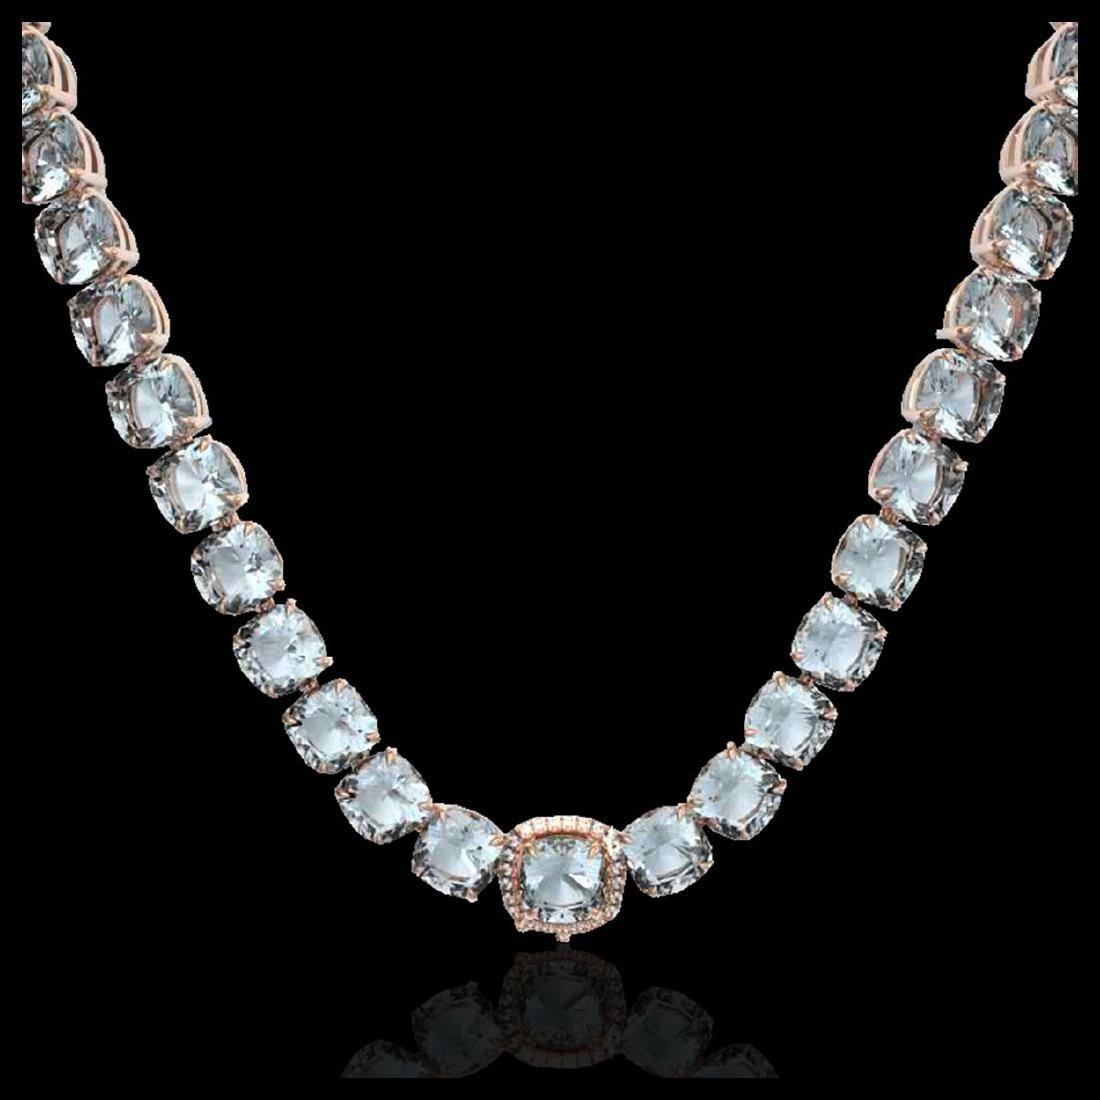 87 ctw Aquamarine & Diamond Eternity Necklace 14K Rose - 2